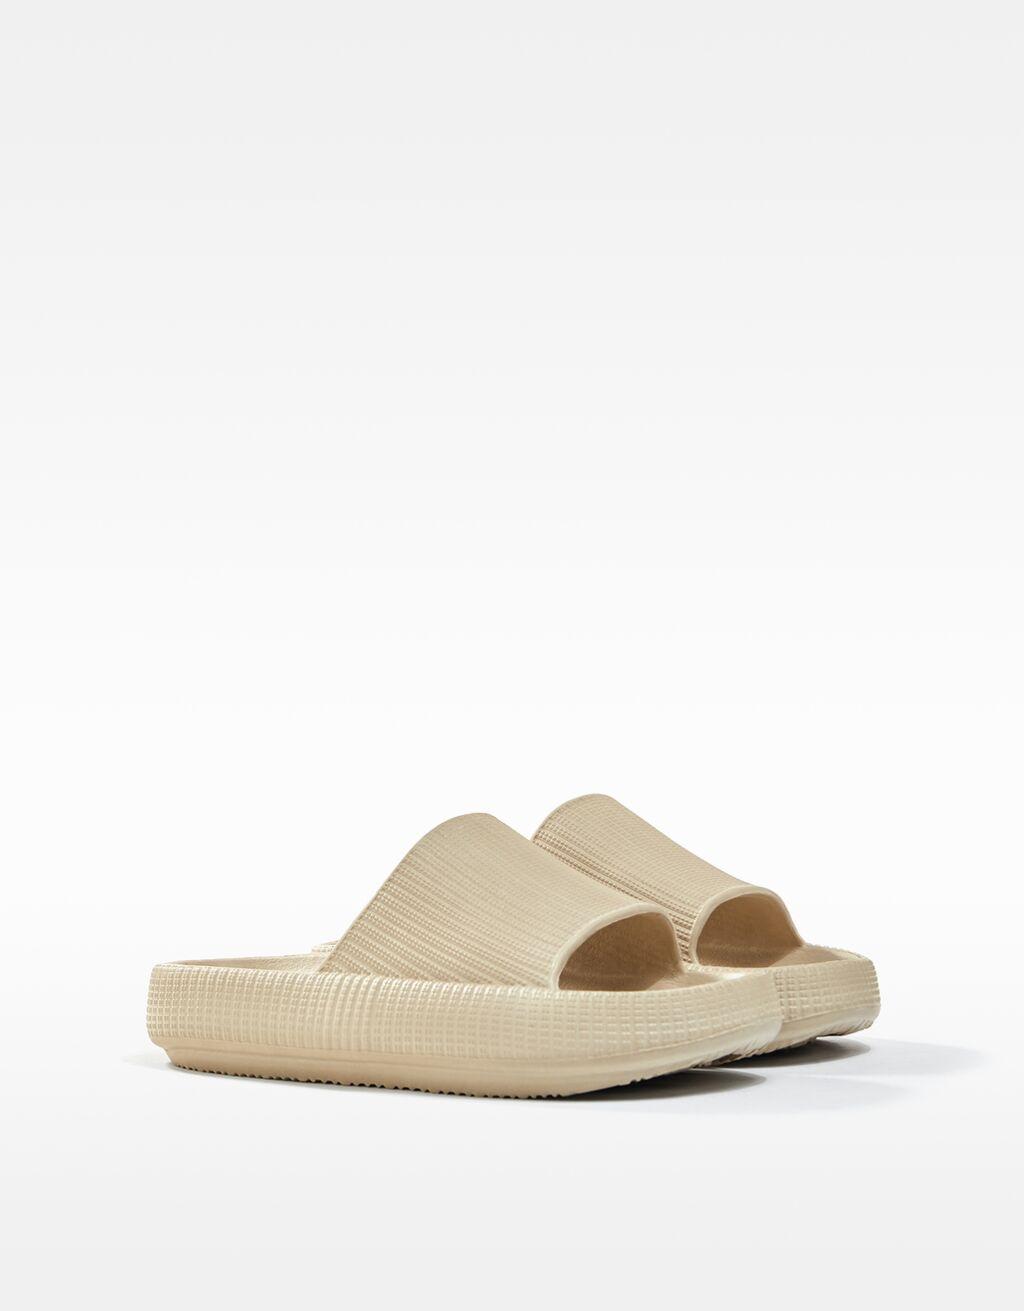 Bershka Sandale 15,99 Euro